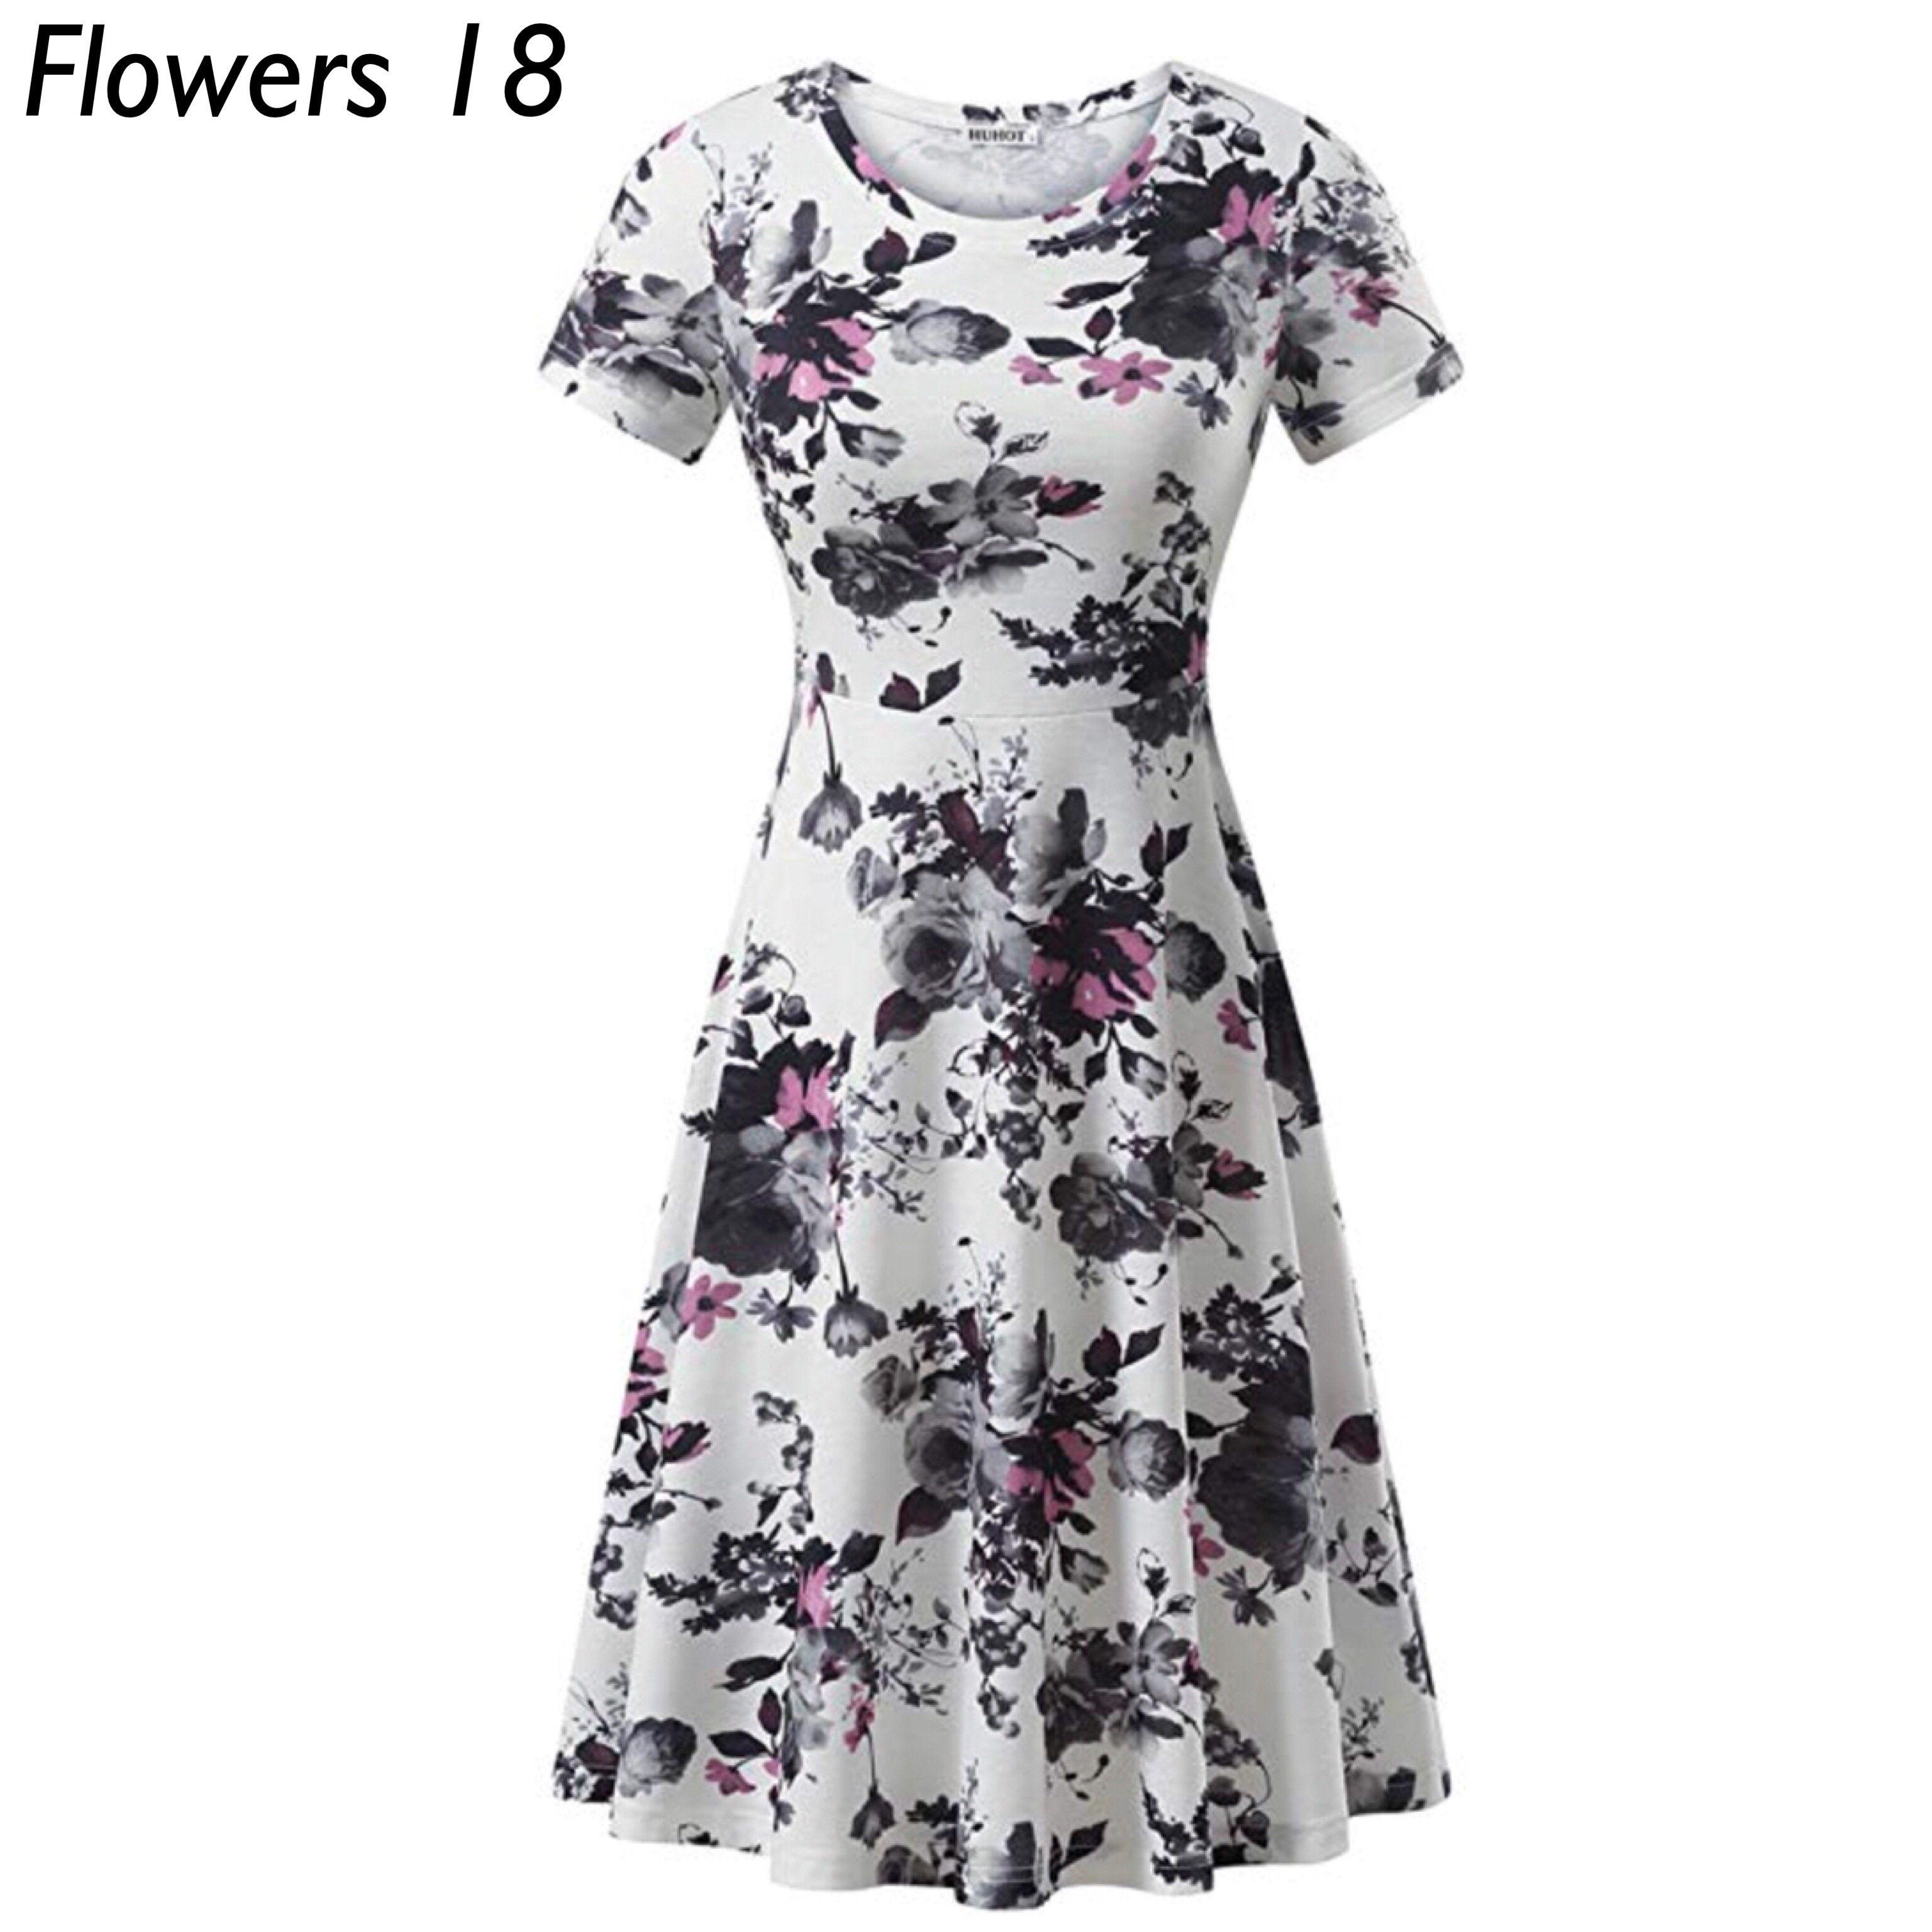 Casual Flared Midi Dress Sizes Xsmall 2xlarge Design Flowers 18 In 2021 Dresses Short Fall Dresses Summer Dresses Knee Length [ 3072 x 3072 Pixel ]